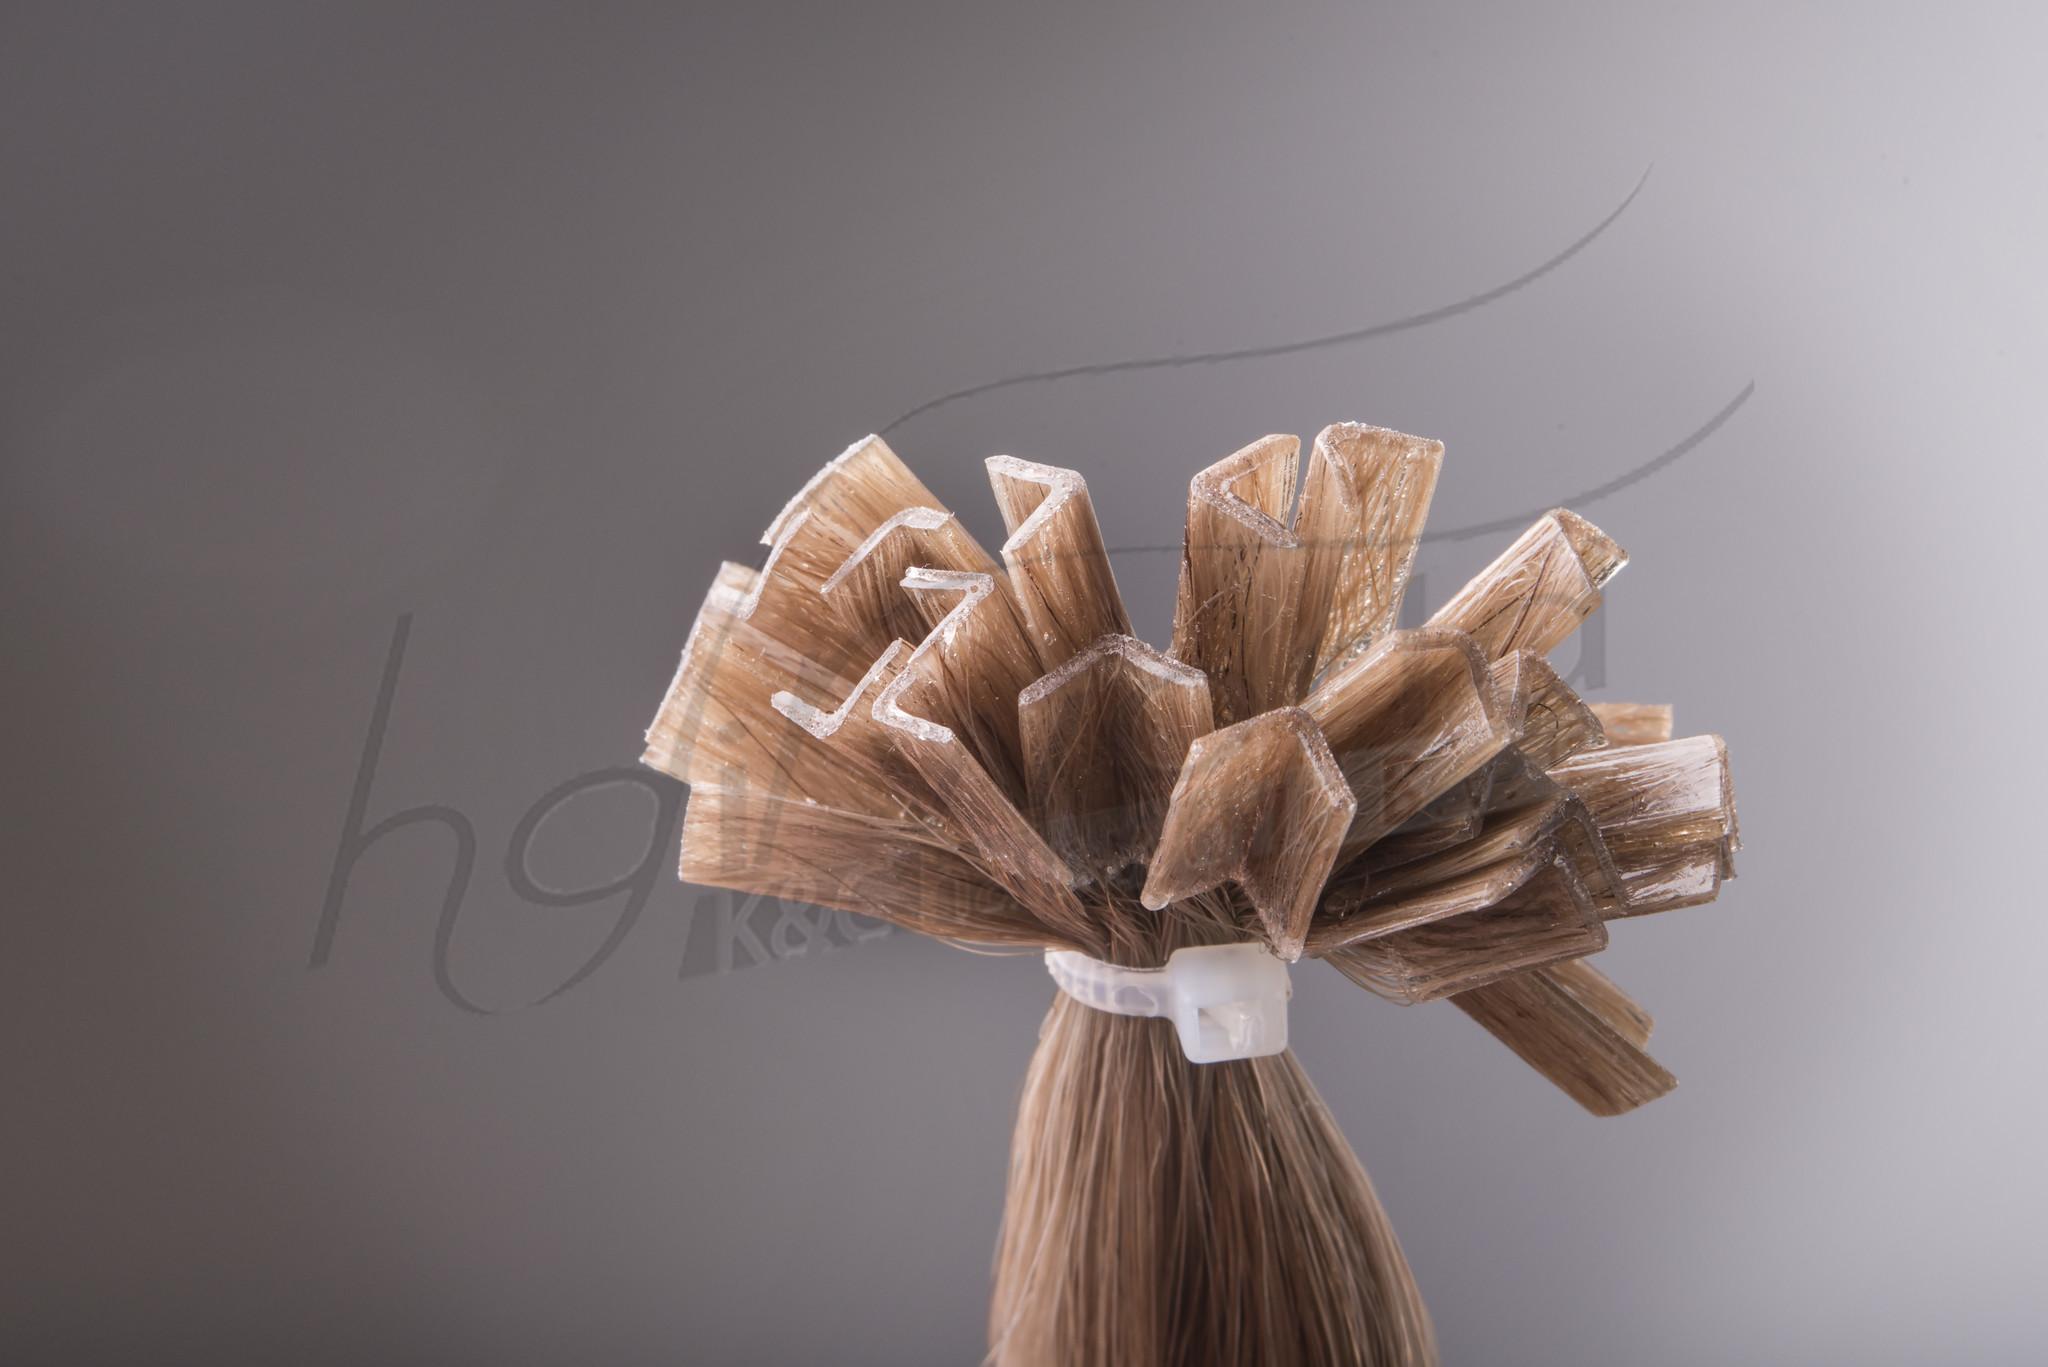 SilverFox Wax Extensions Steil  #12 Ash Blonde